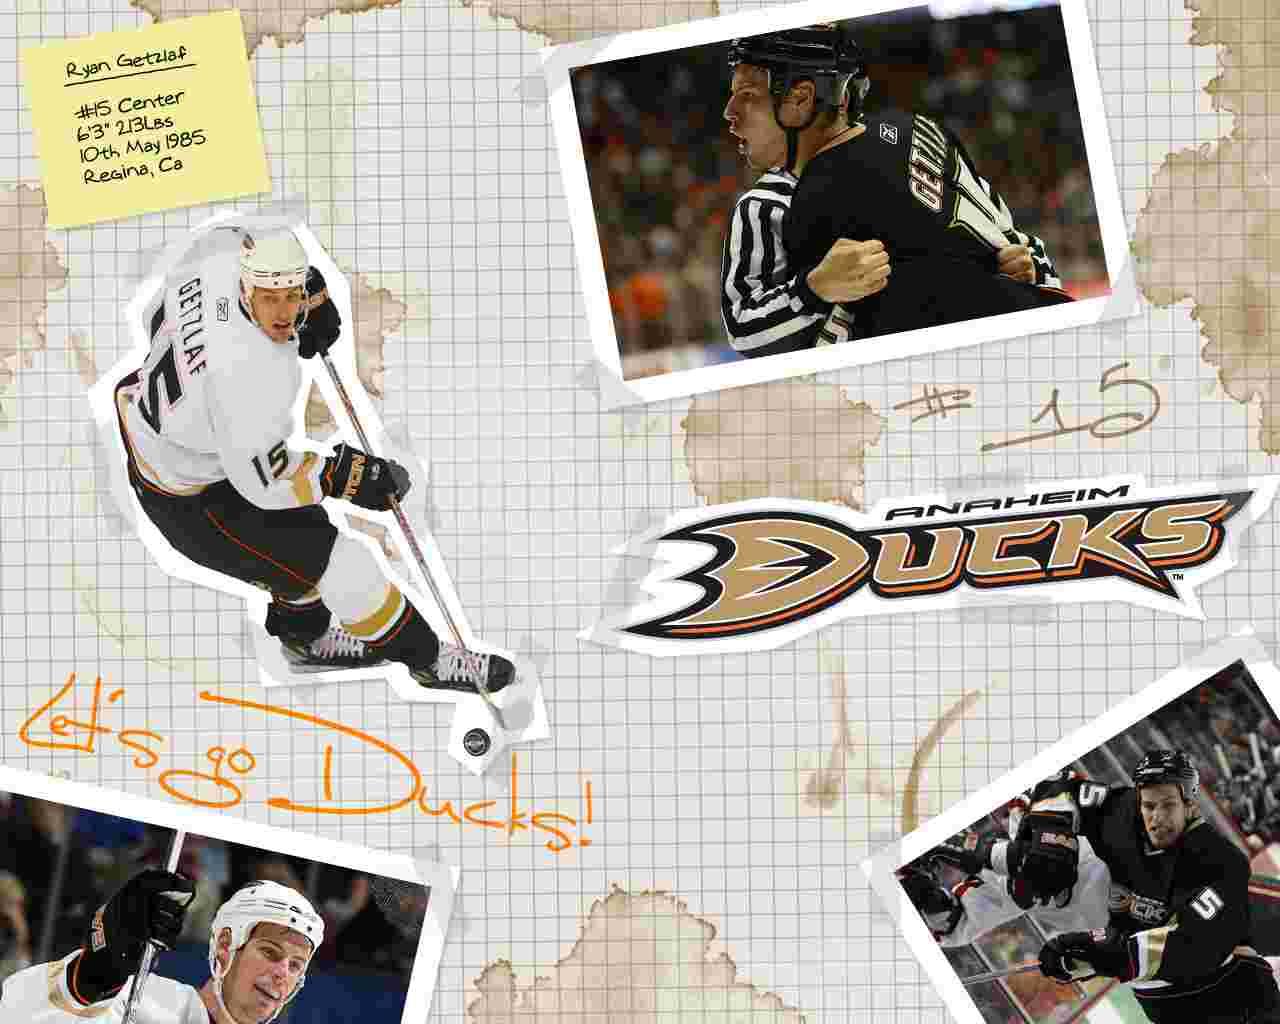 Ryan Getzlaf Ducks wallpaper   Hockey   Sport   Wallpaper Collection 1280x1024